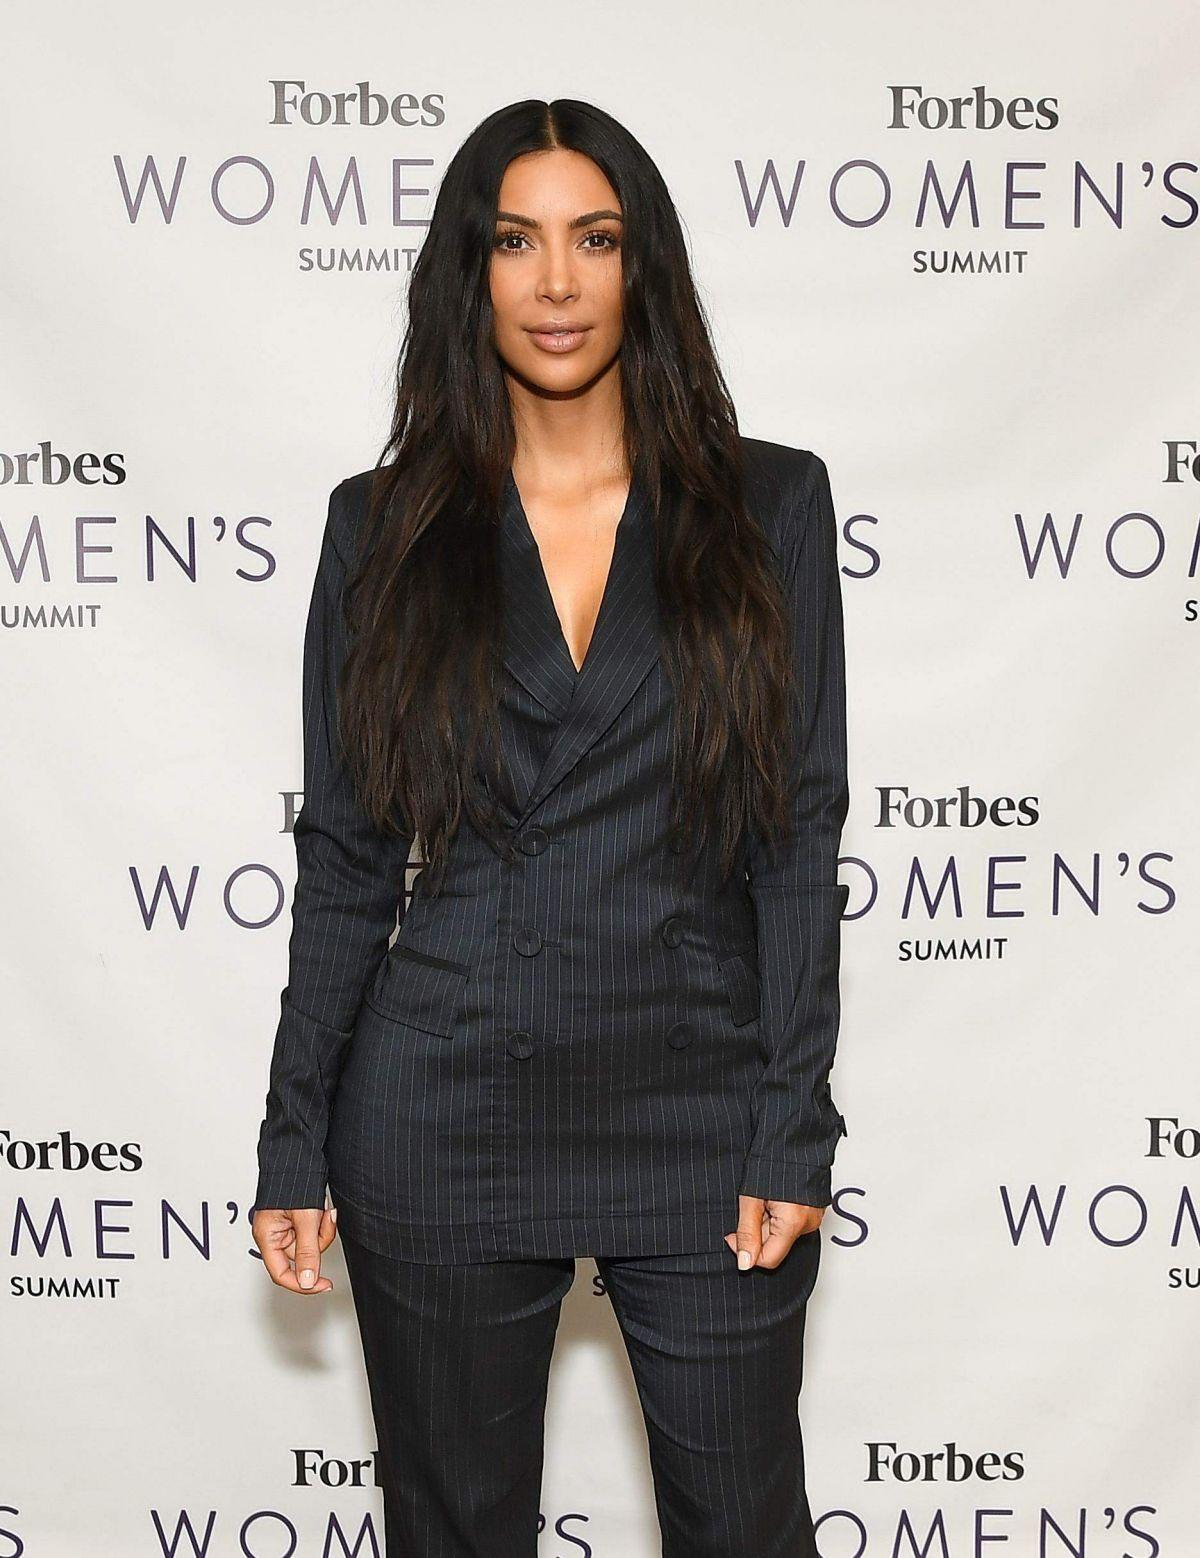 KIM KARDASHIAN at Forbes Women